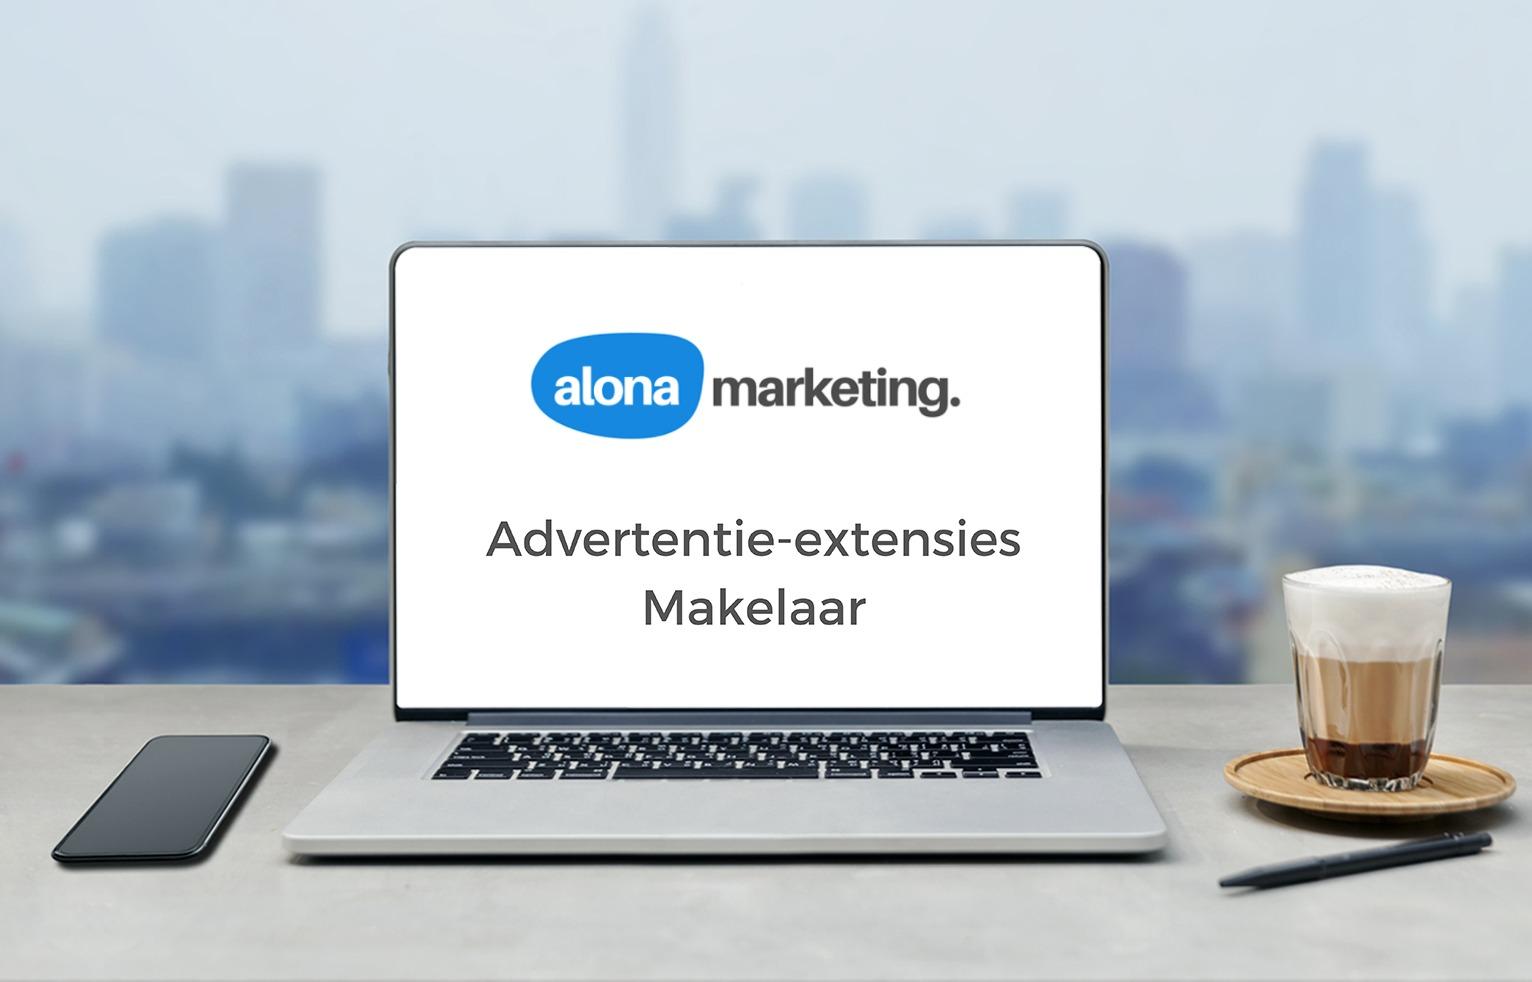 Advertentie-extensies Makelaar